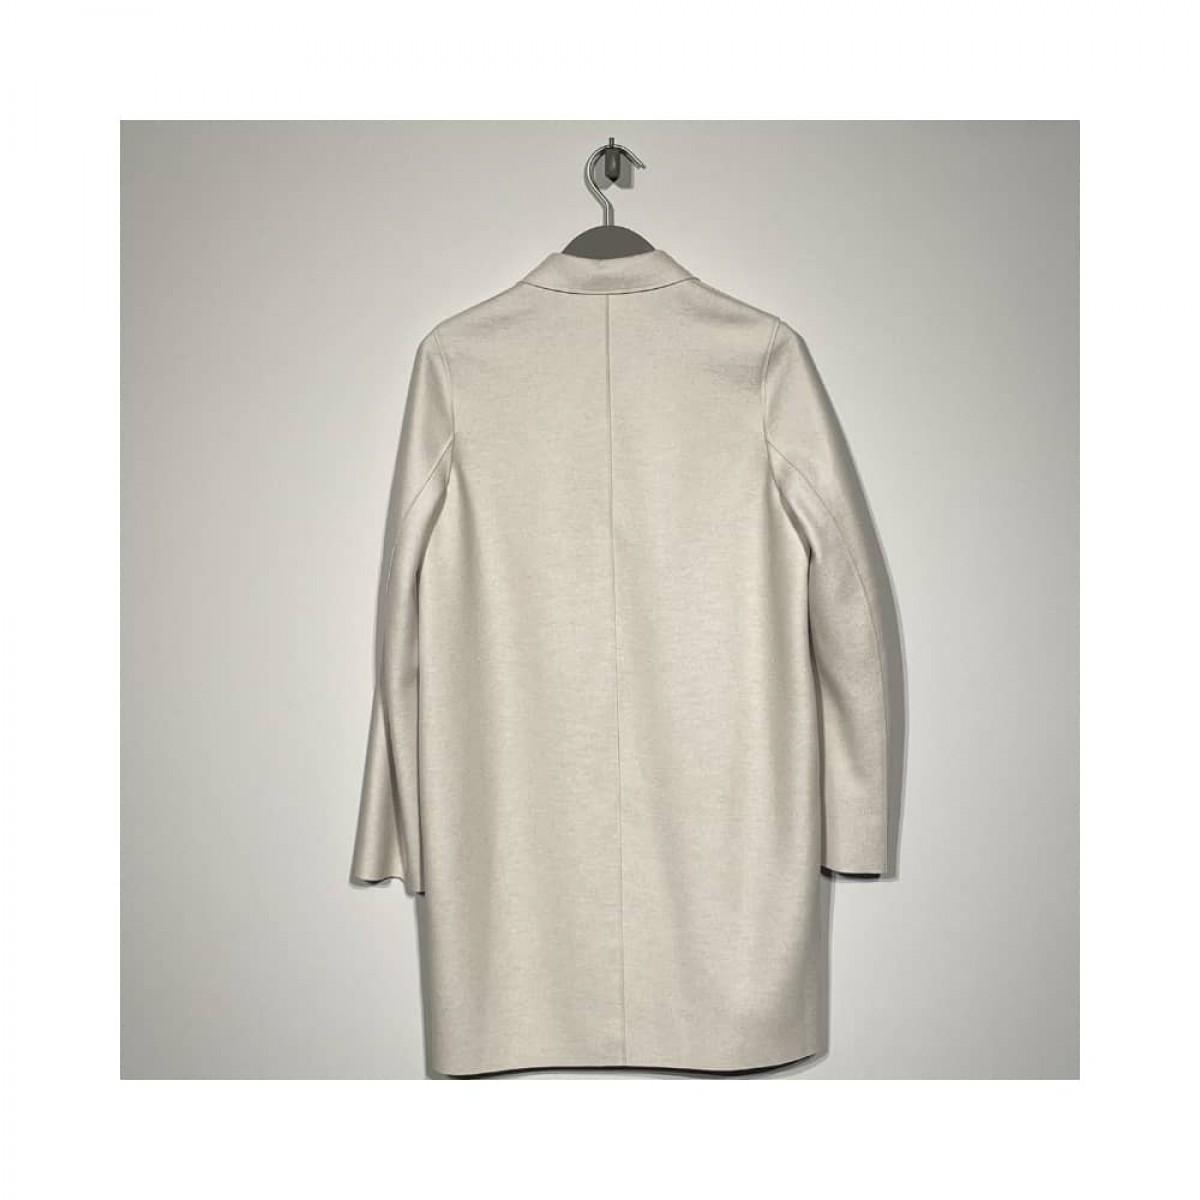 coccon coat - cream - bag